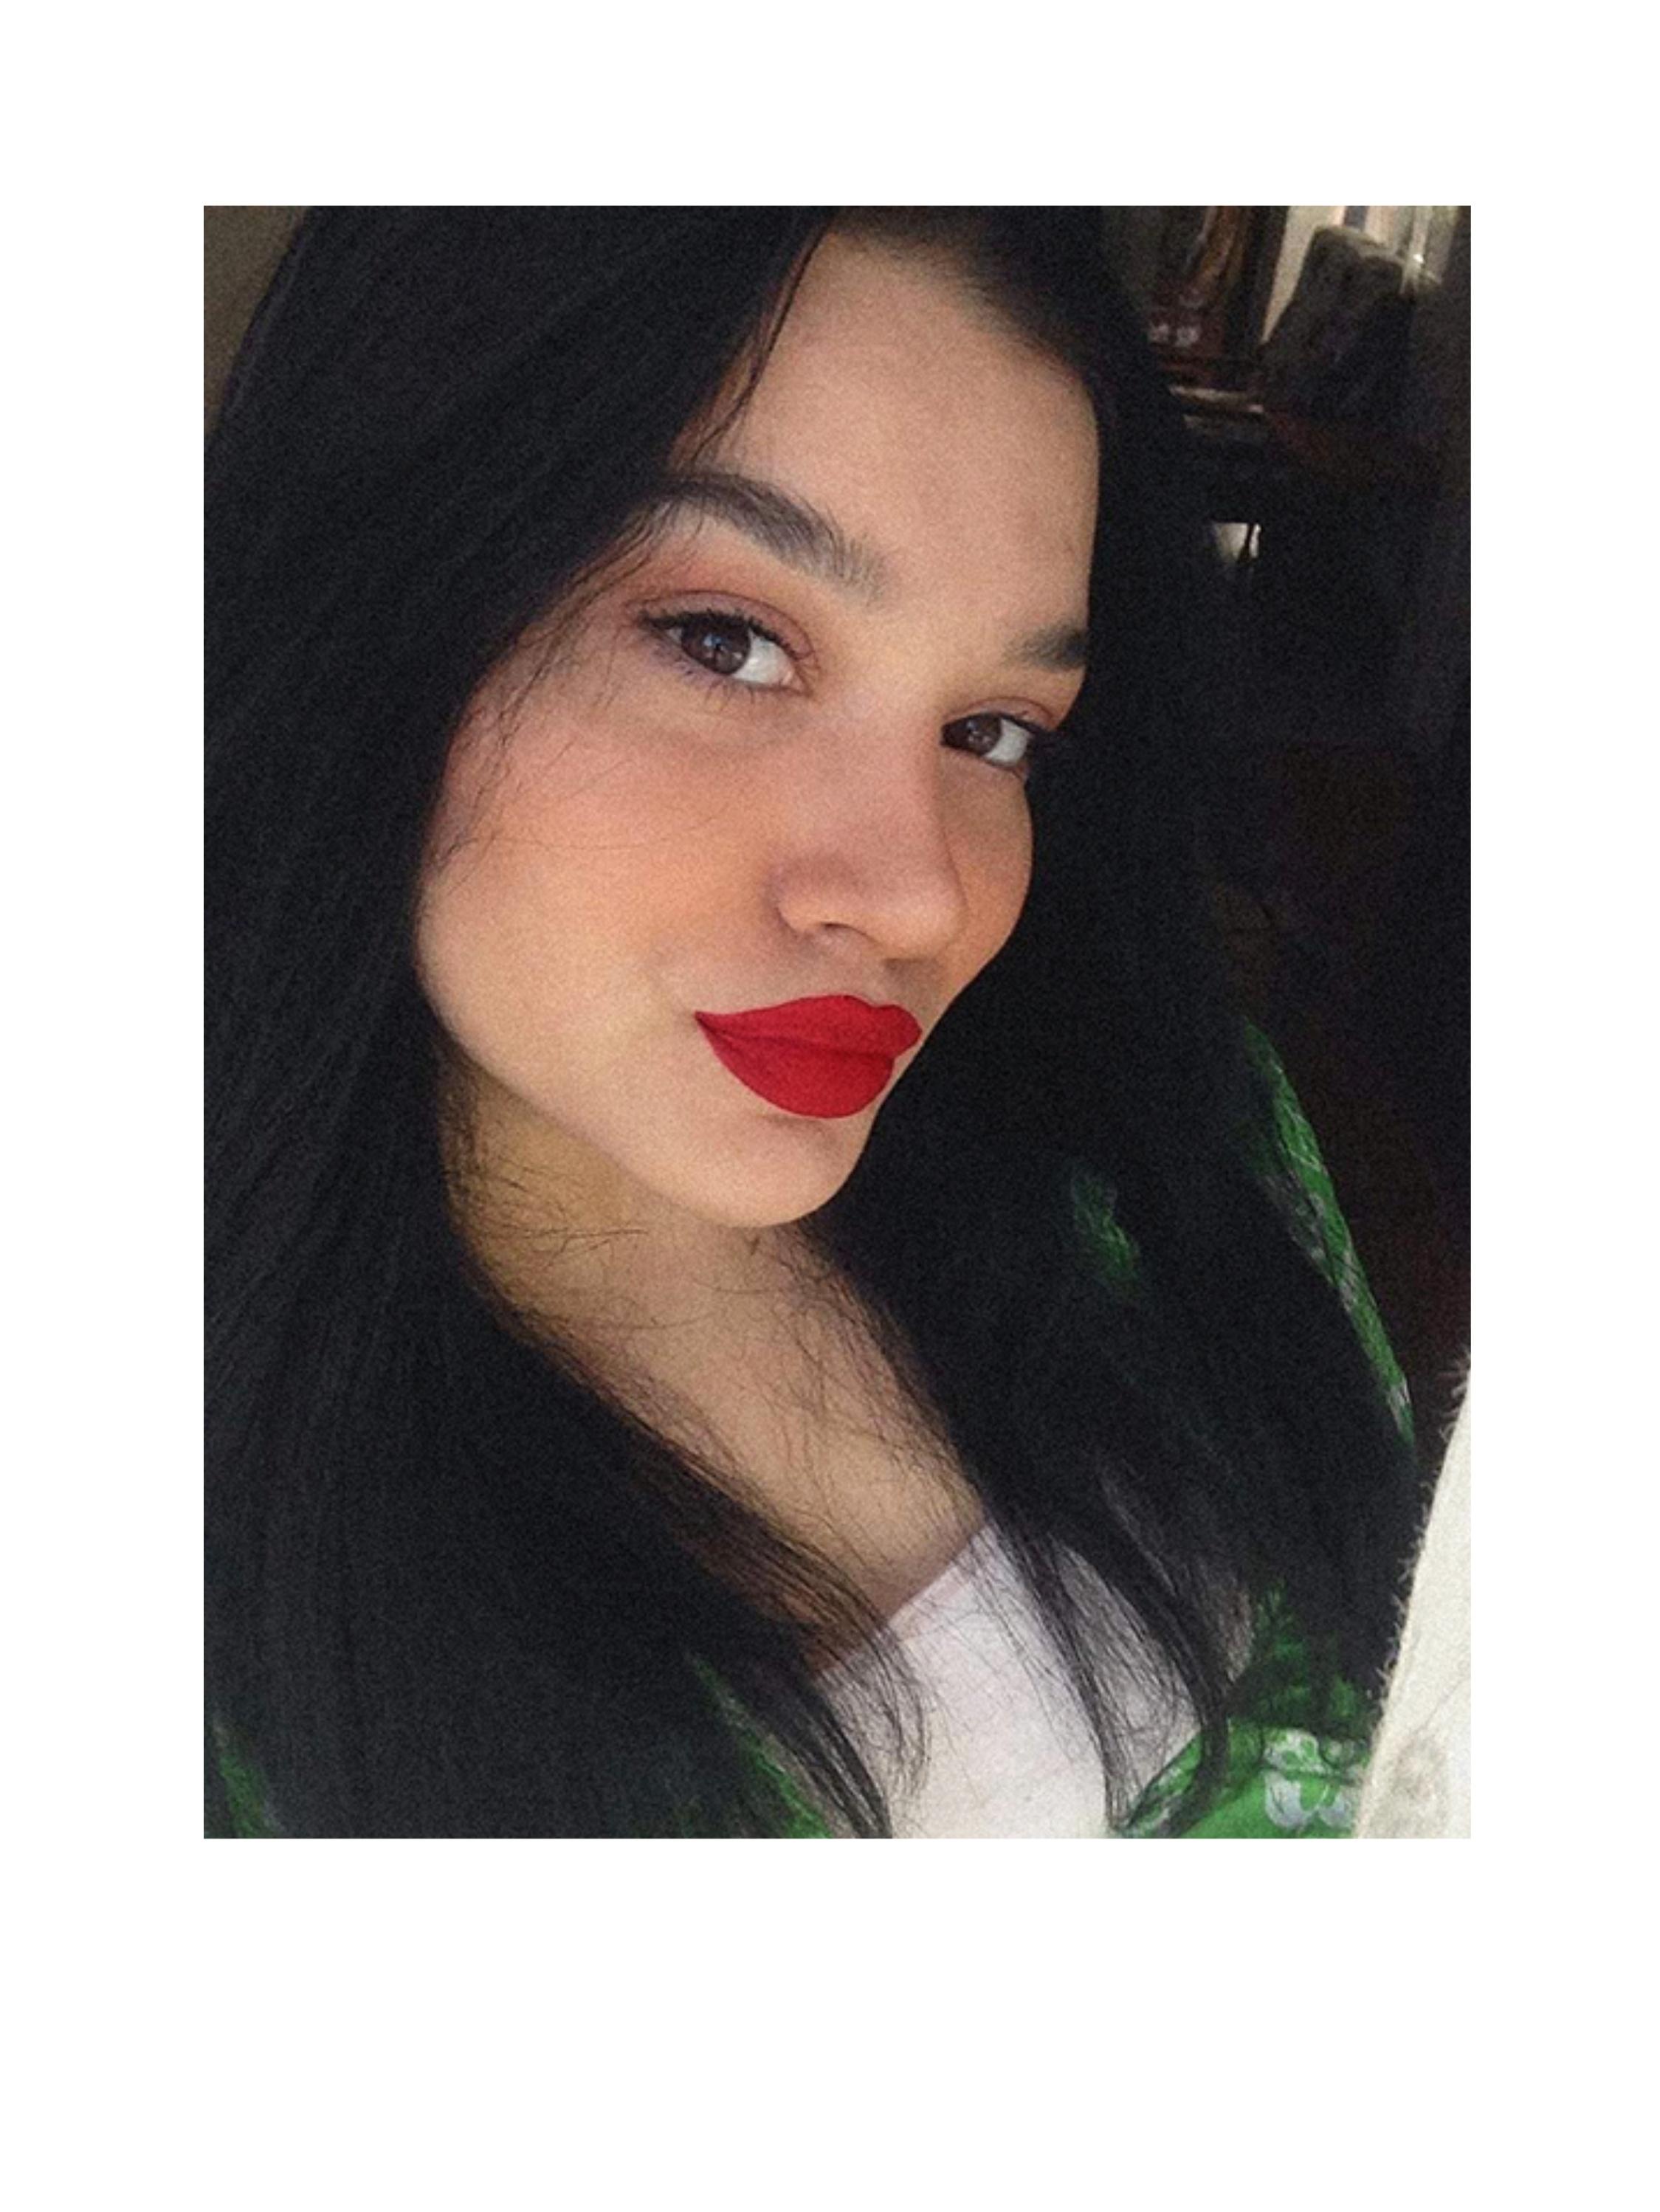 BeautyPlus_20200504001306591_save - ryuklemobi